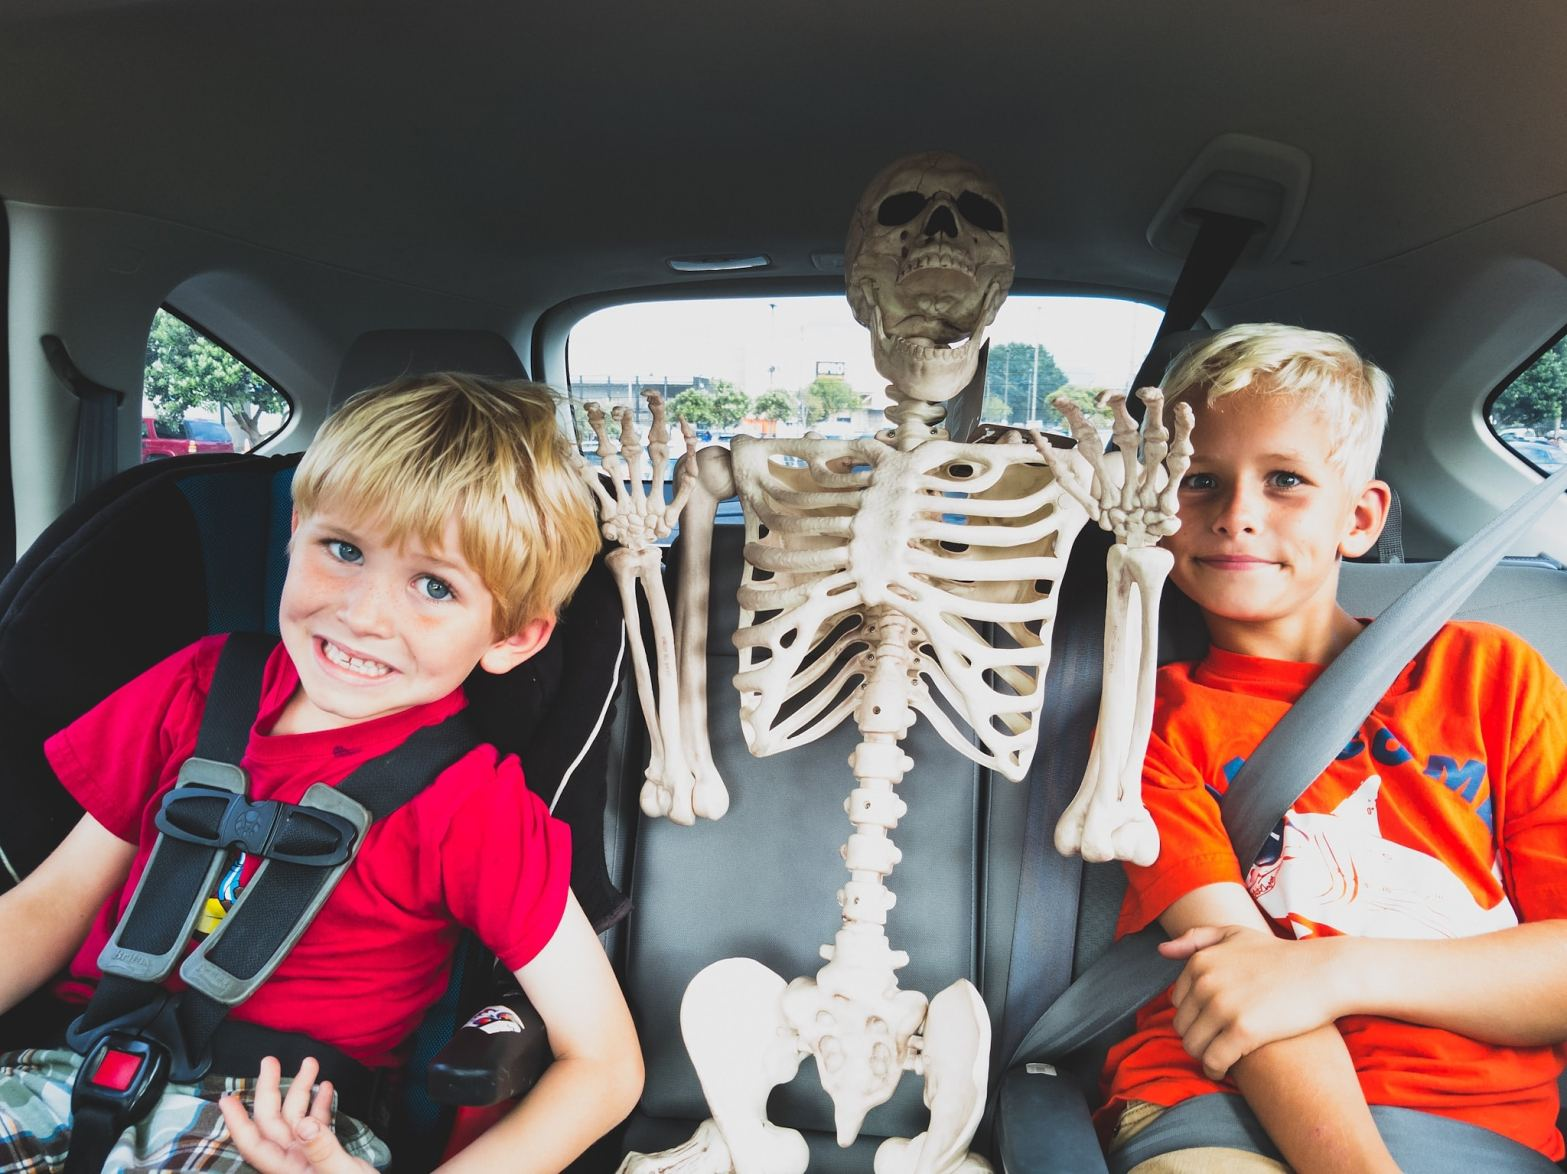 Elliot & Dylan in the backseat